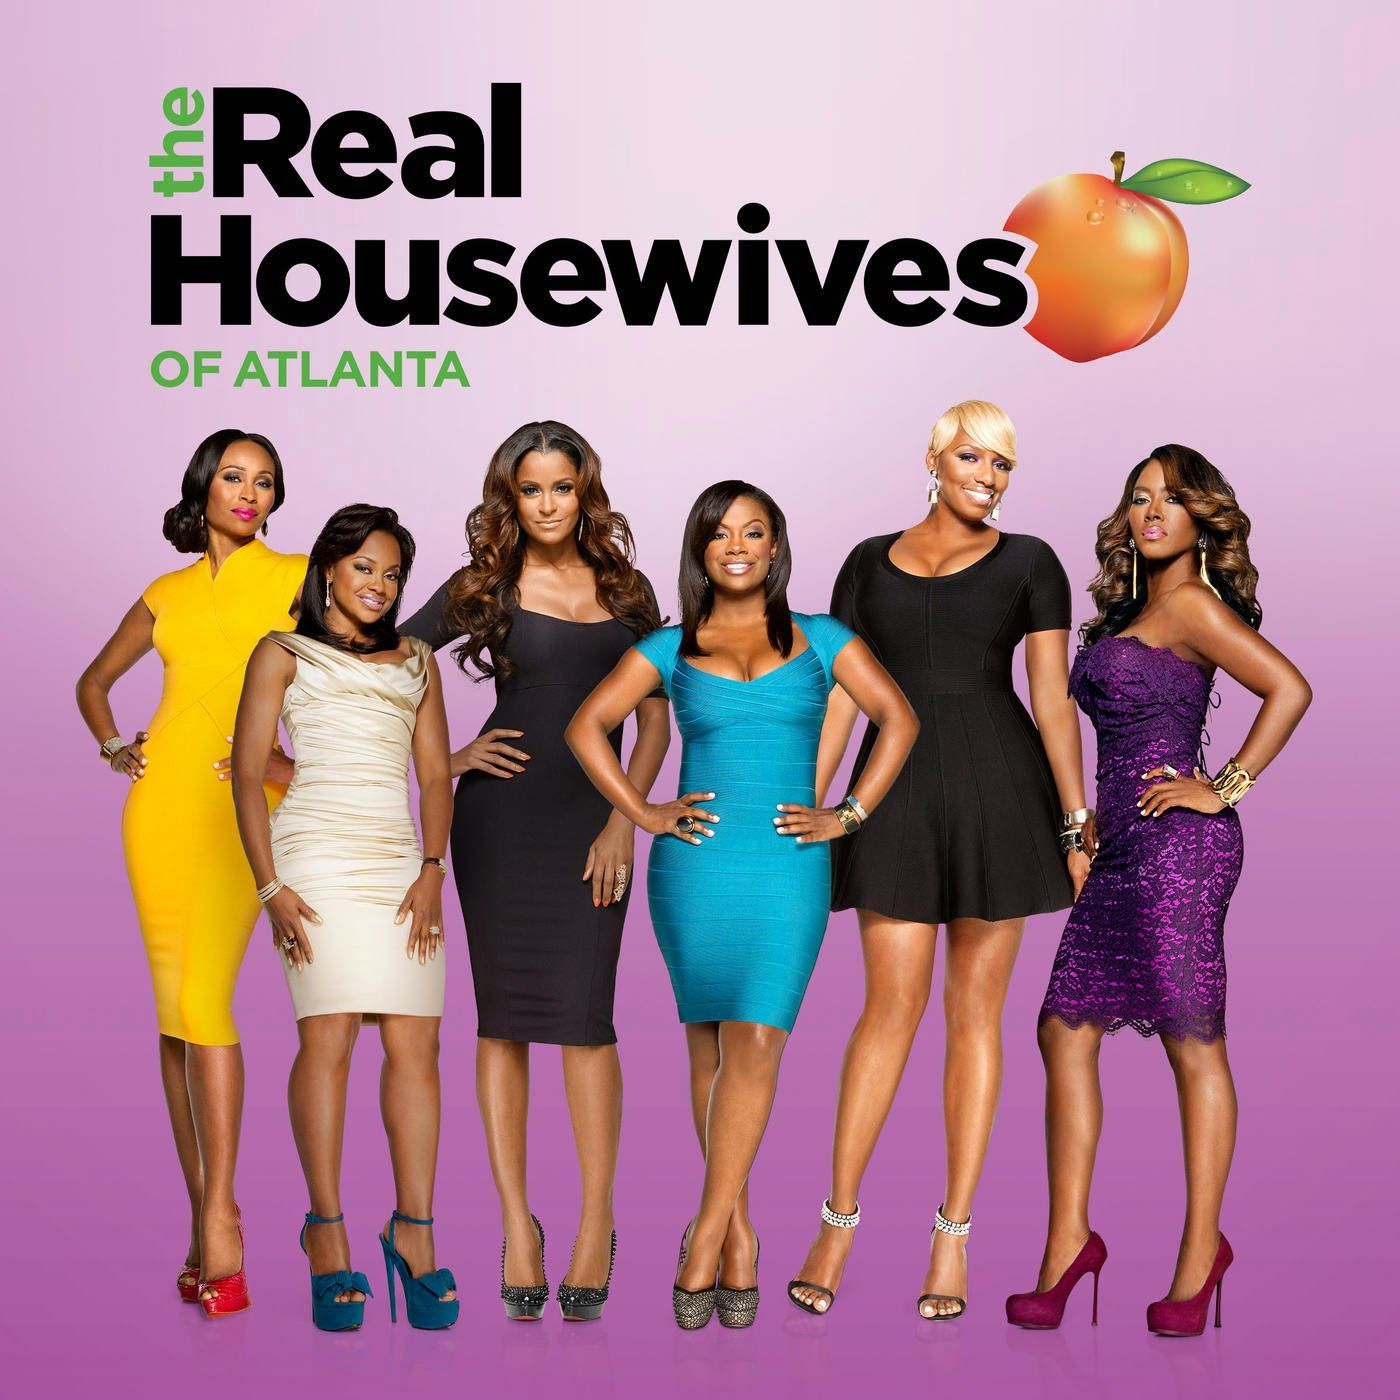 Rhoa Sneak Peek Nene Leakes Gives Claudia Jordan The Cold Shoulder Roger Bobb Cheating On Demetria Mckinney Housewives Of Atlanta Real Housewives Tv Seasons